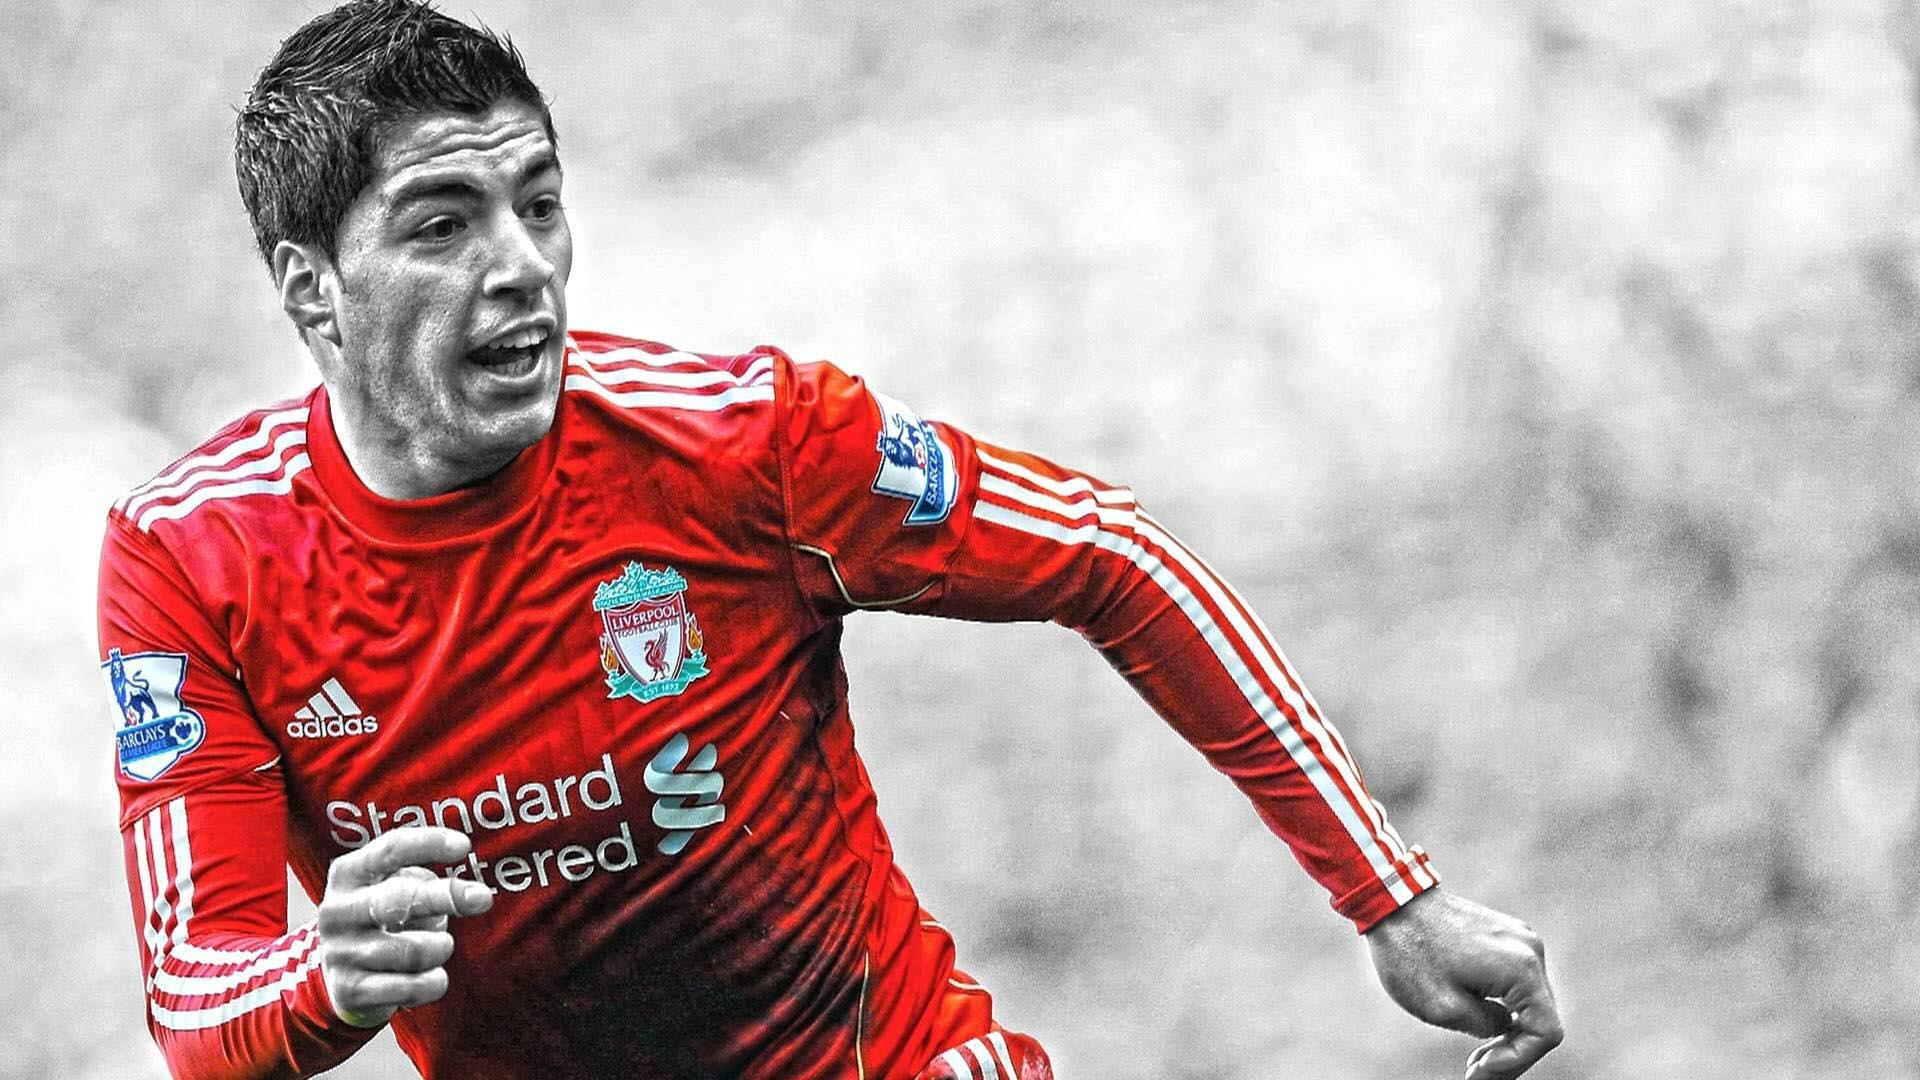 Popular player Luis Suarez wallpaper in HD 1920x1080